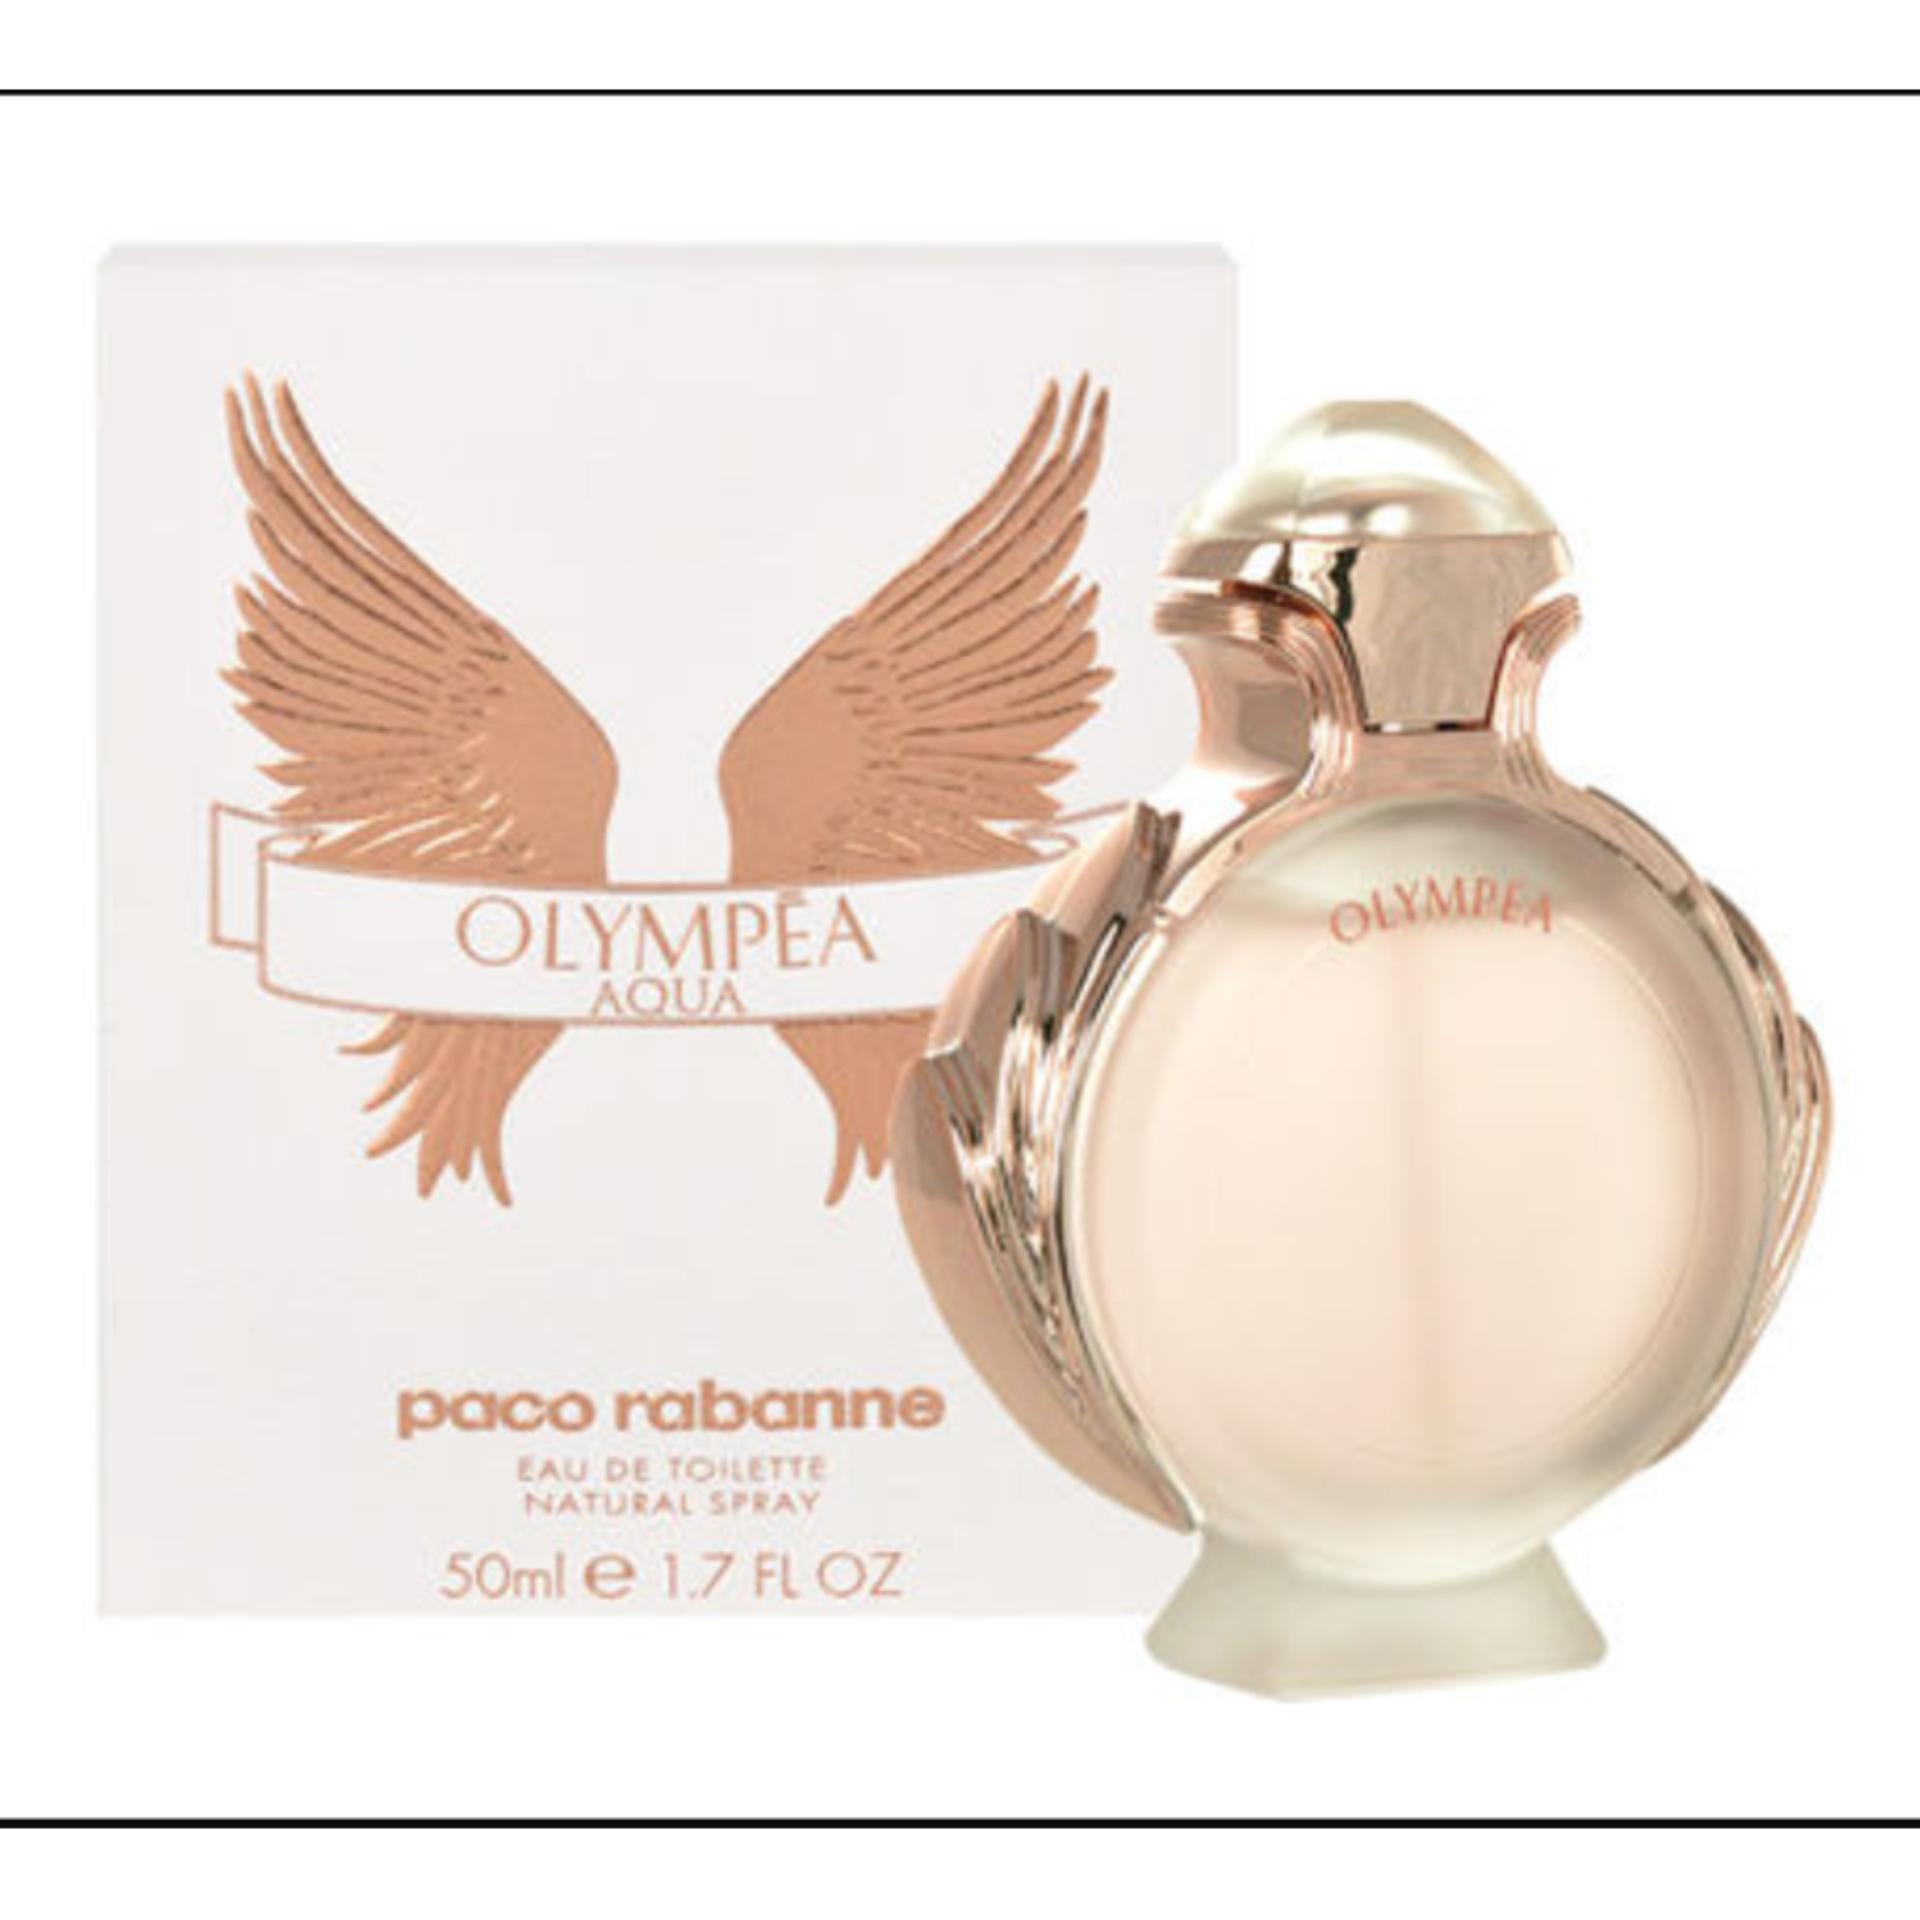 Olympea Aqua Paco Rabanne for Women